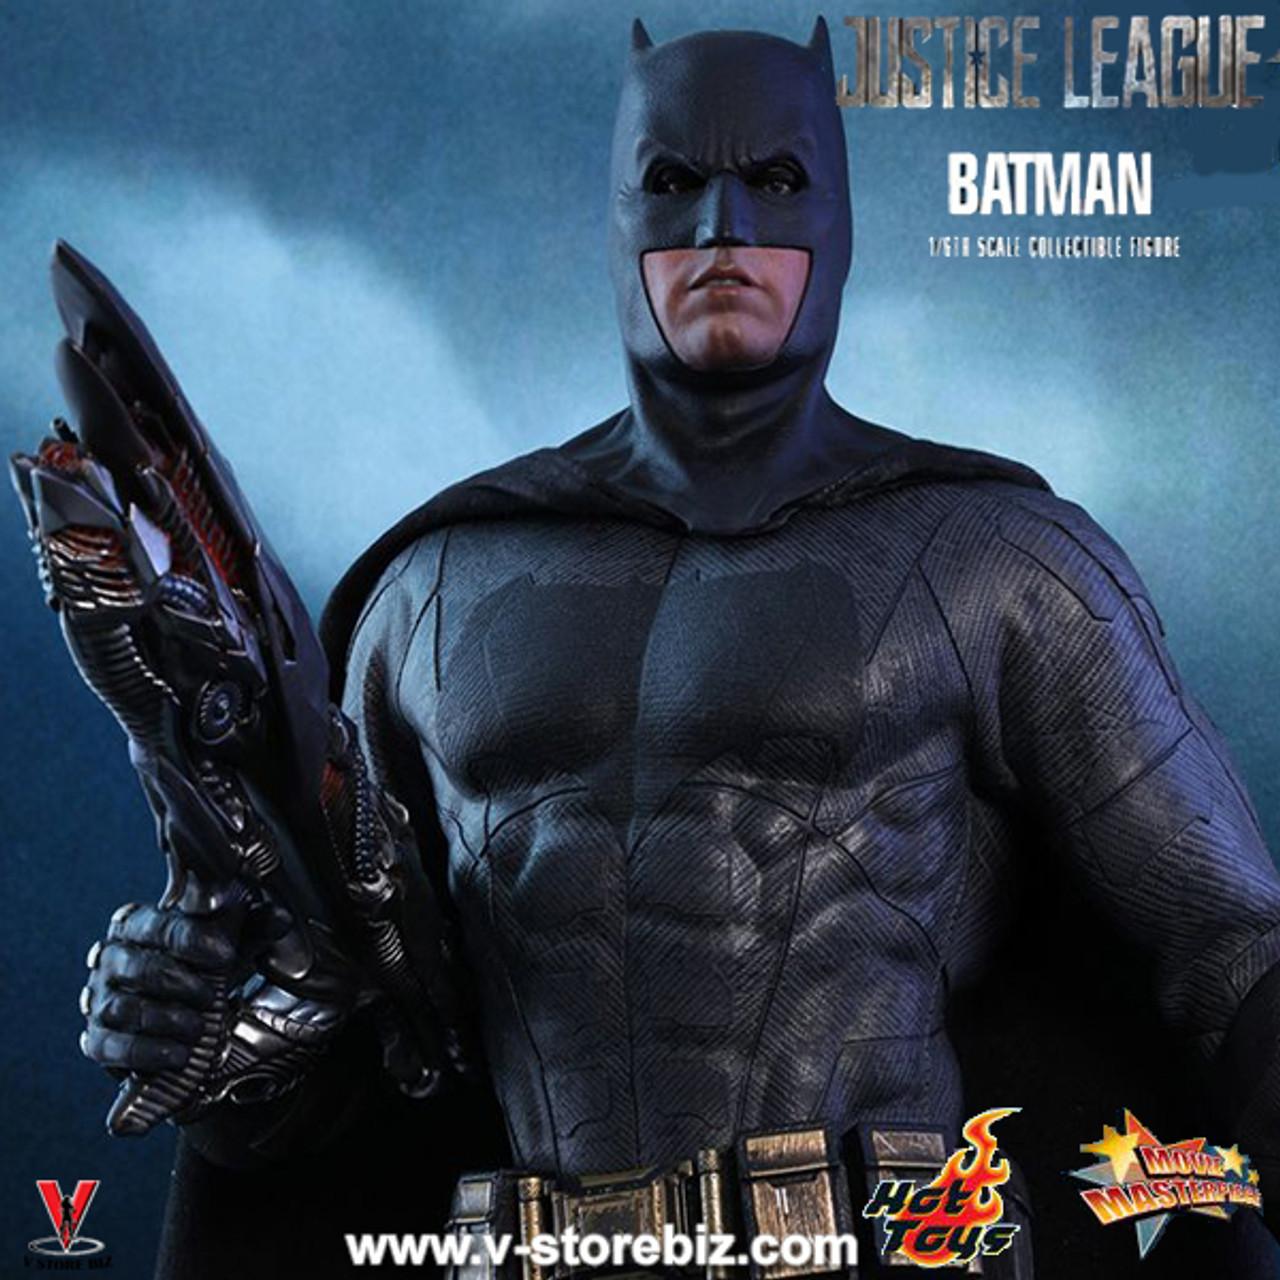 Hot Toys Batman Justice League MMS455 Bruce Wayne Sculpt loose 1//6th scale